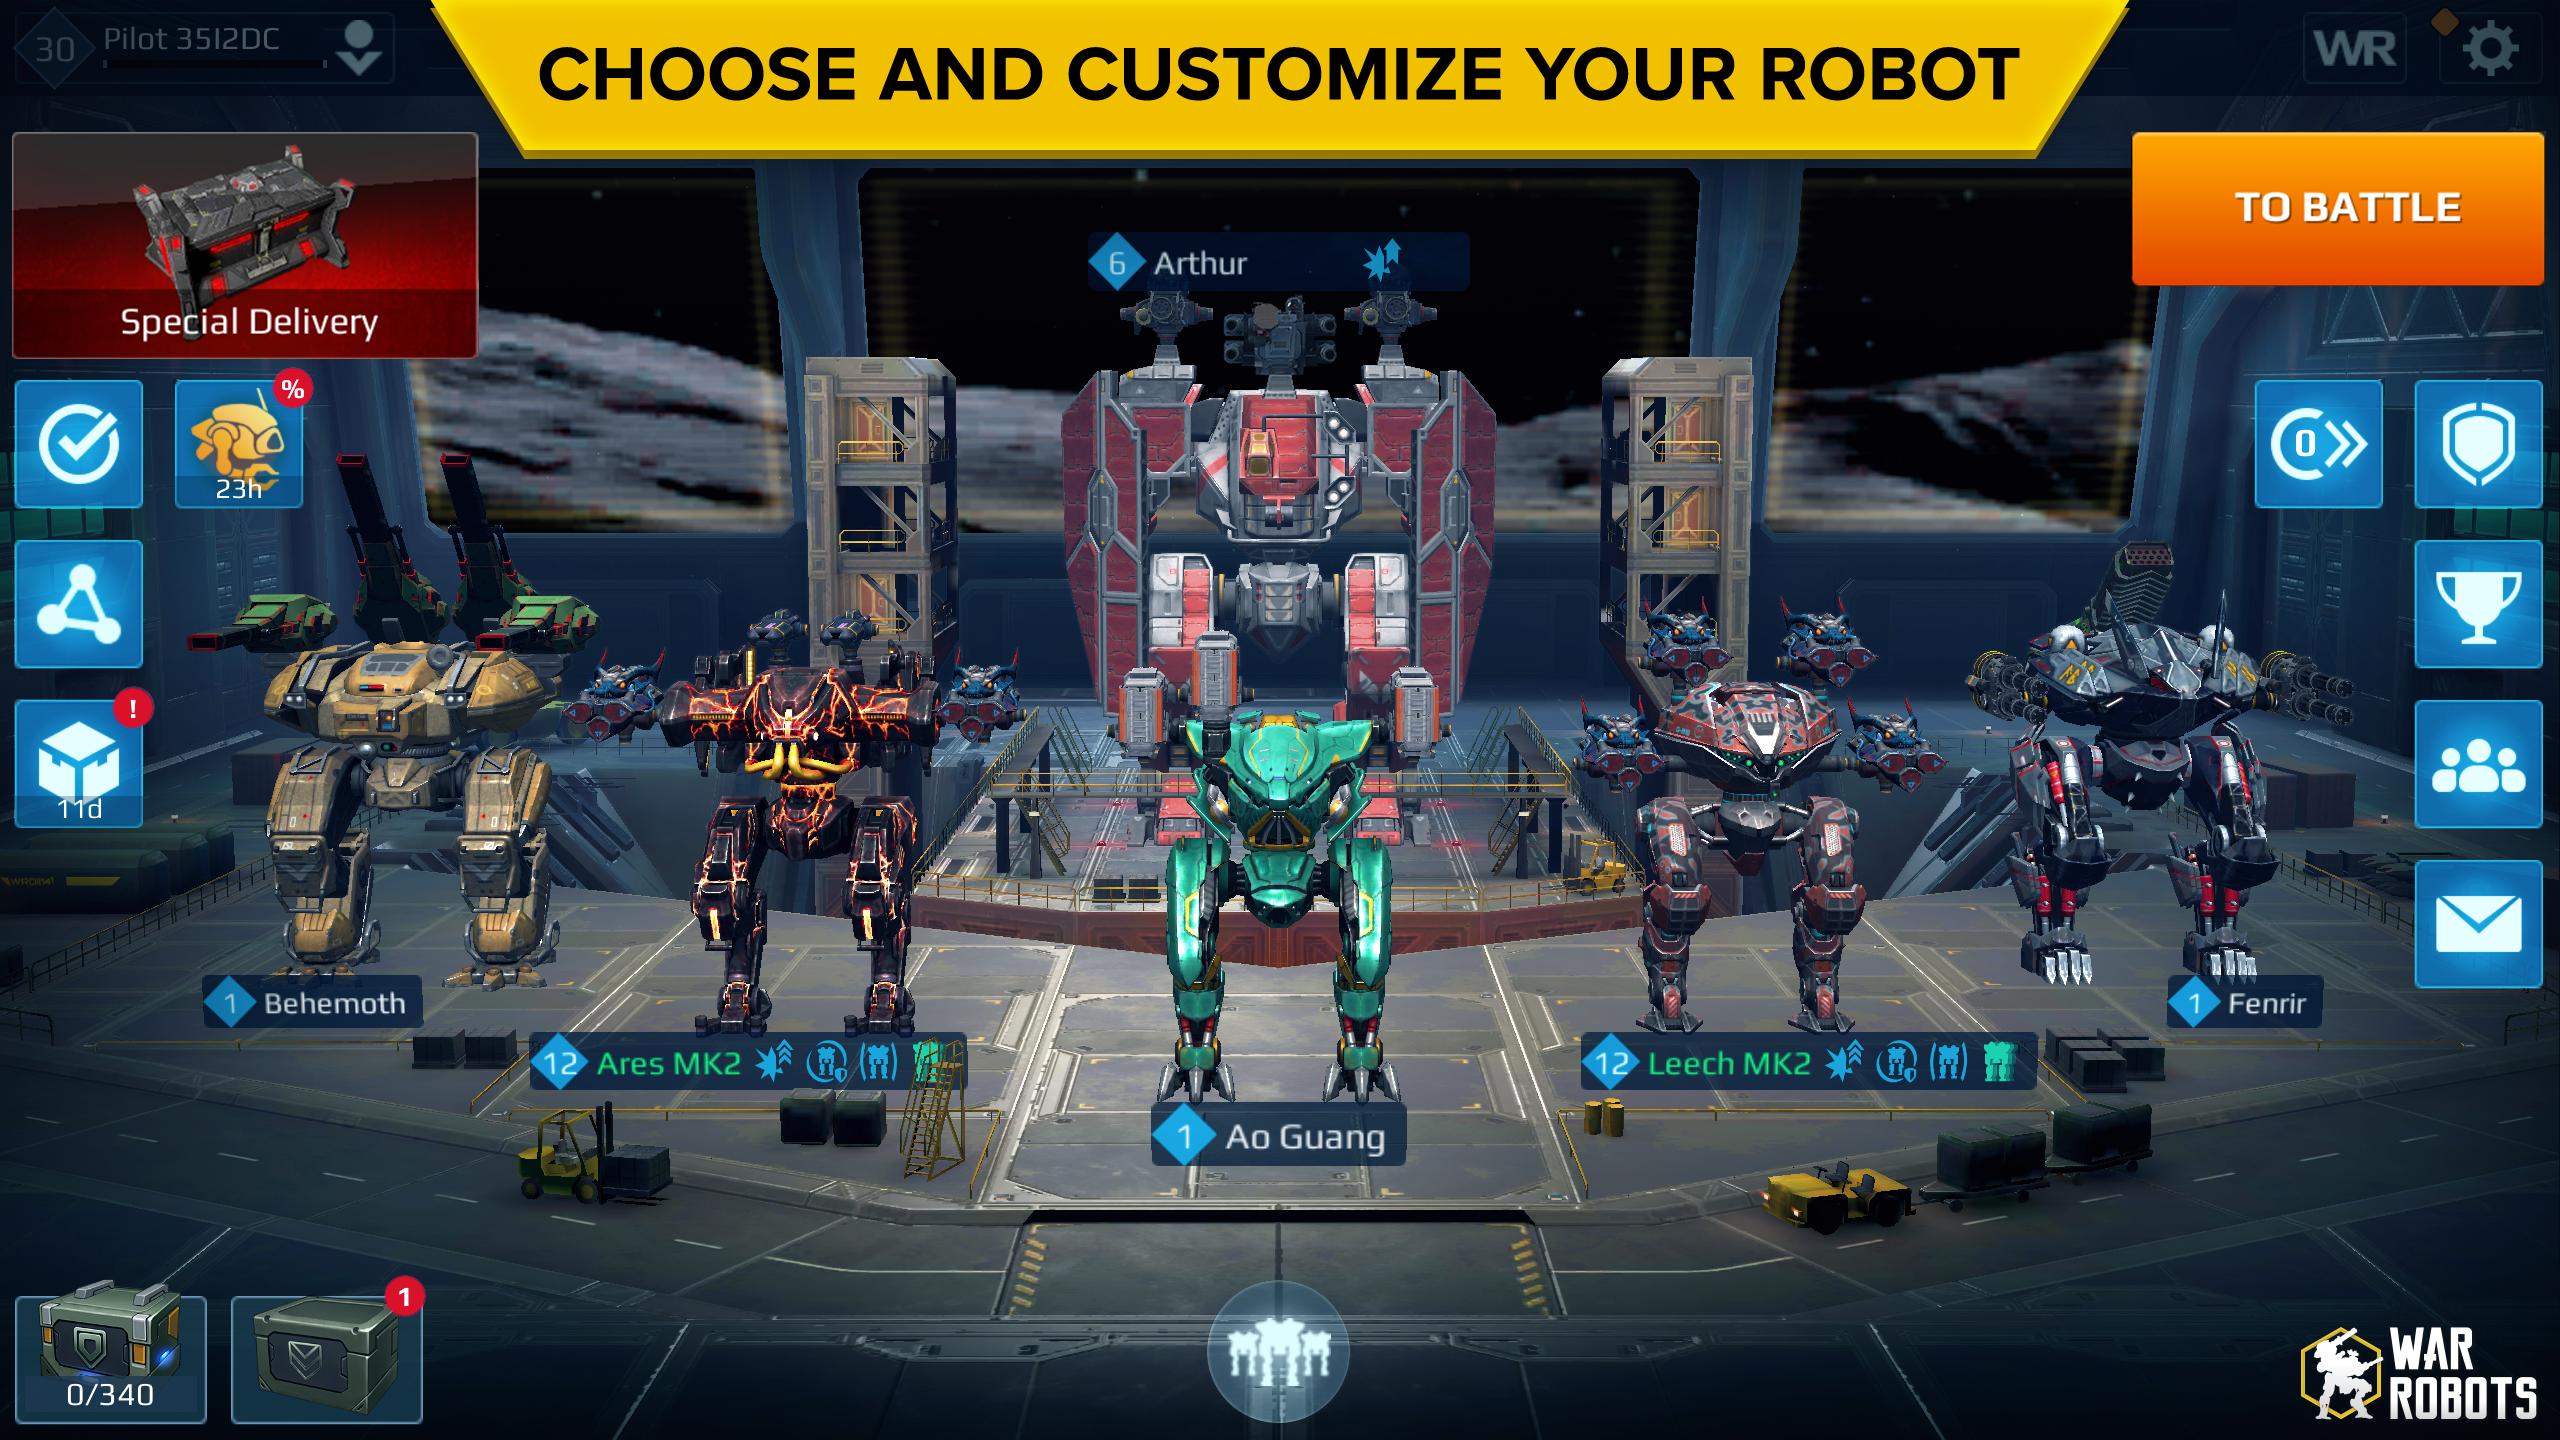 War Robots 6.4.0 APK + Mod + DATA unlimited ammo